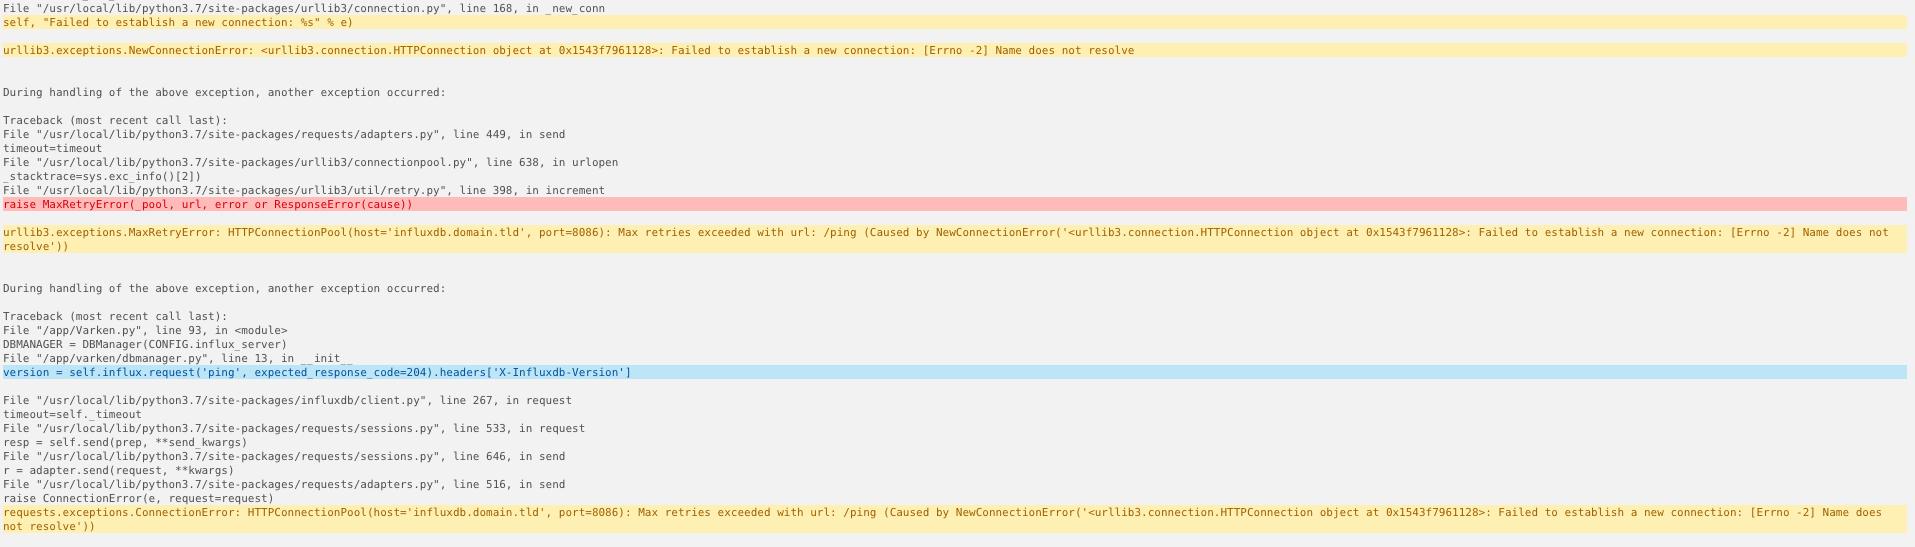 Can't connect to InfluxDB · Issue #110 · Boerderij/Varken